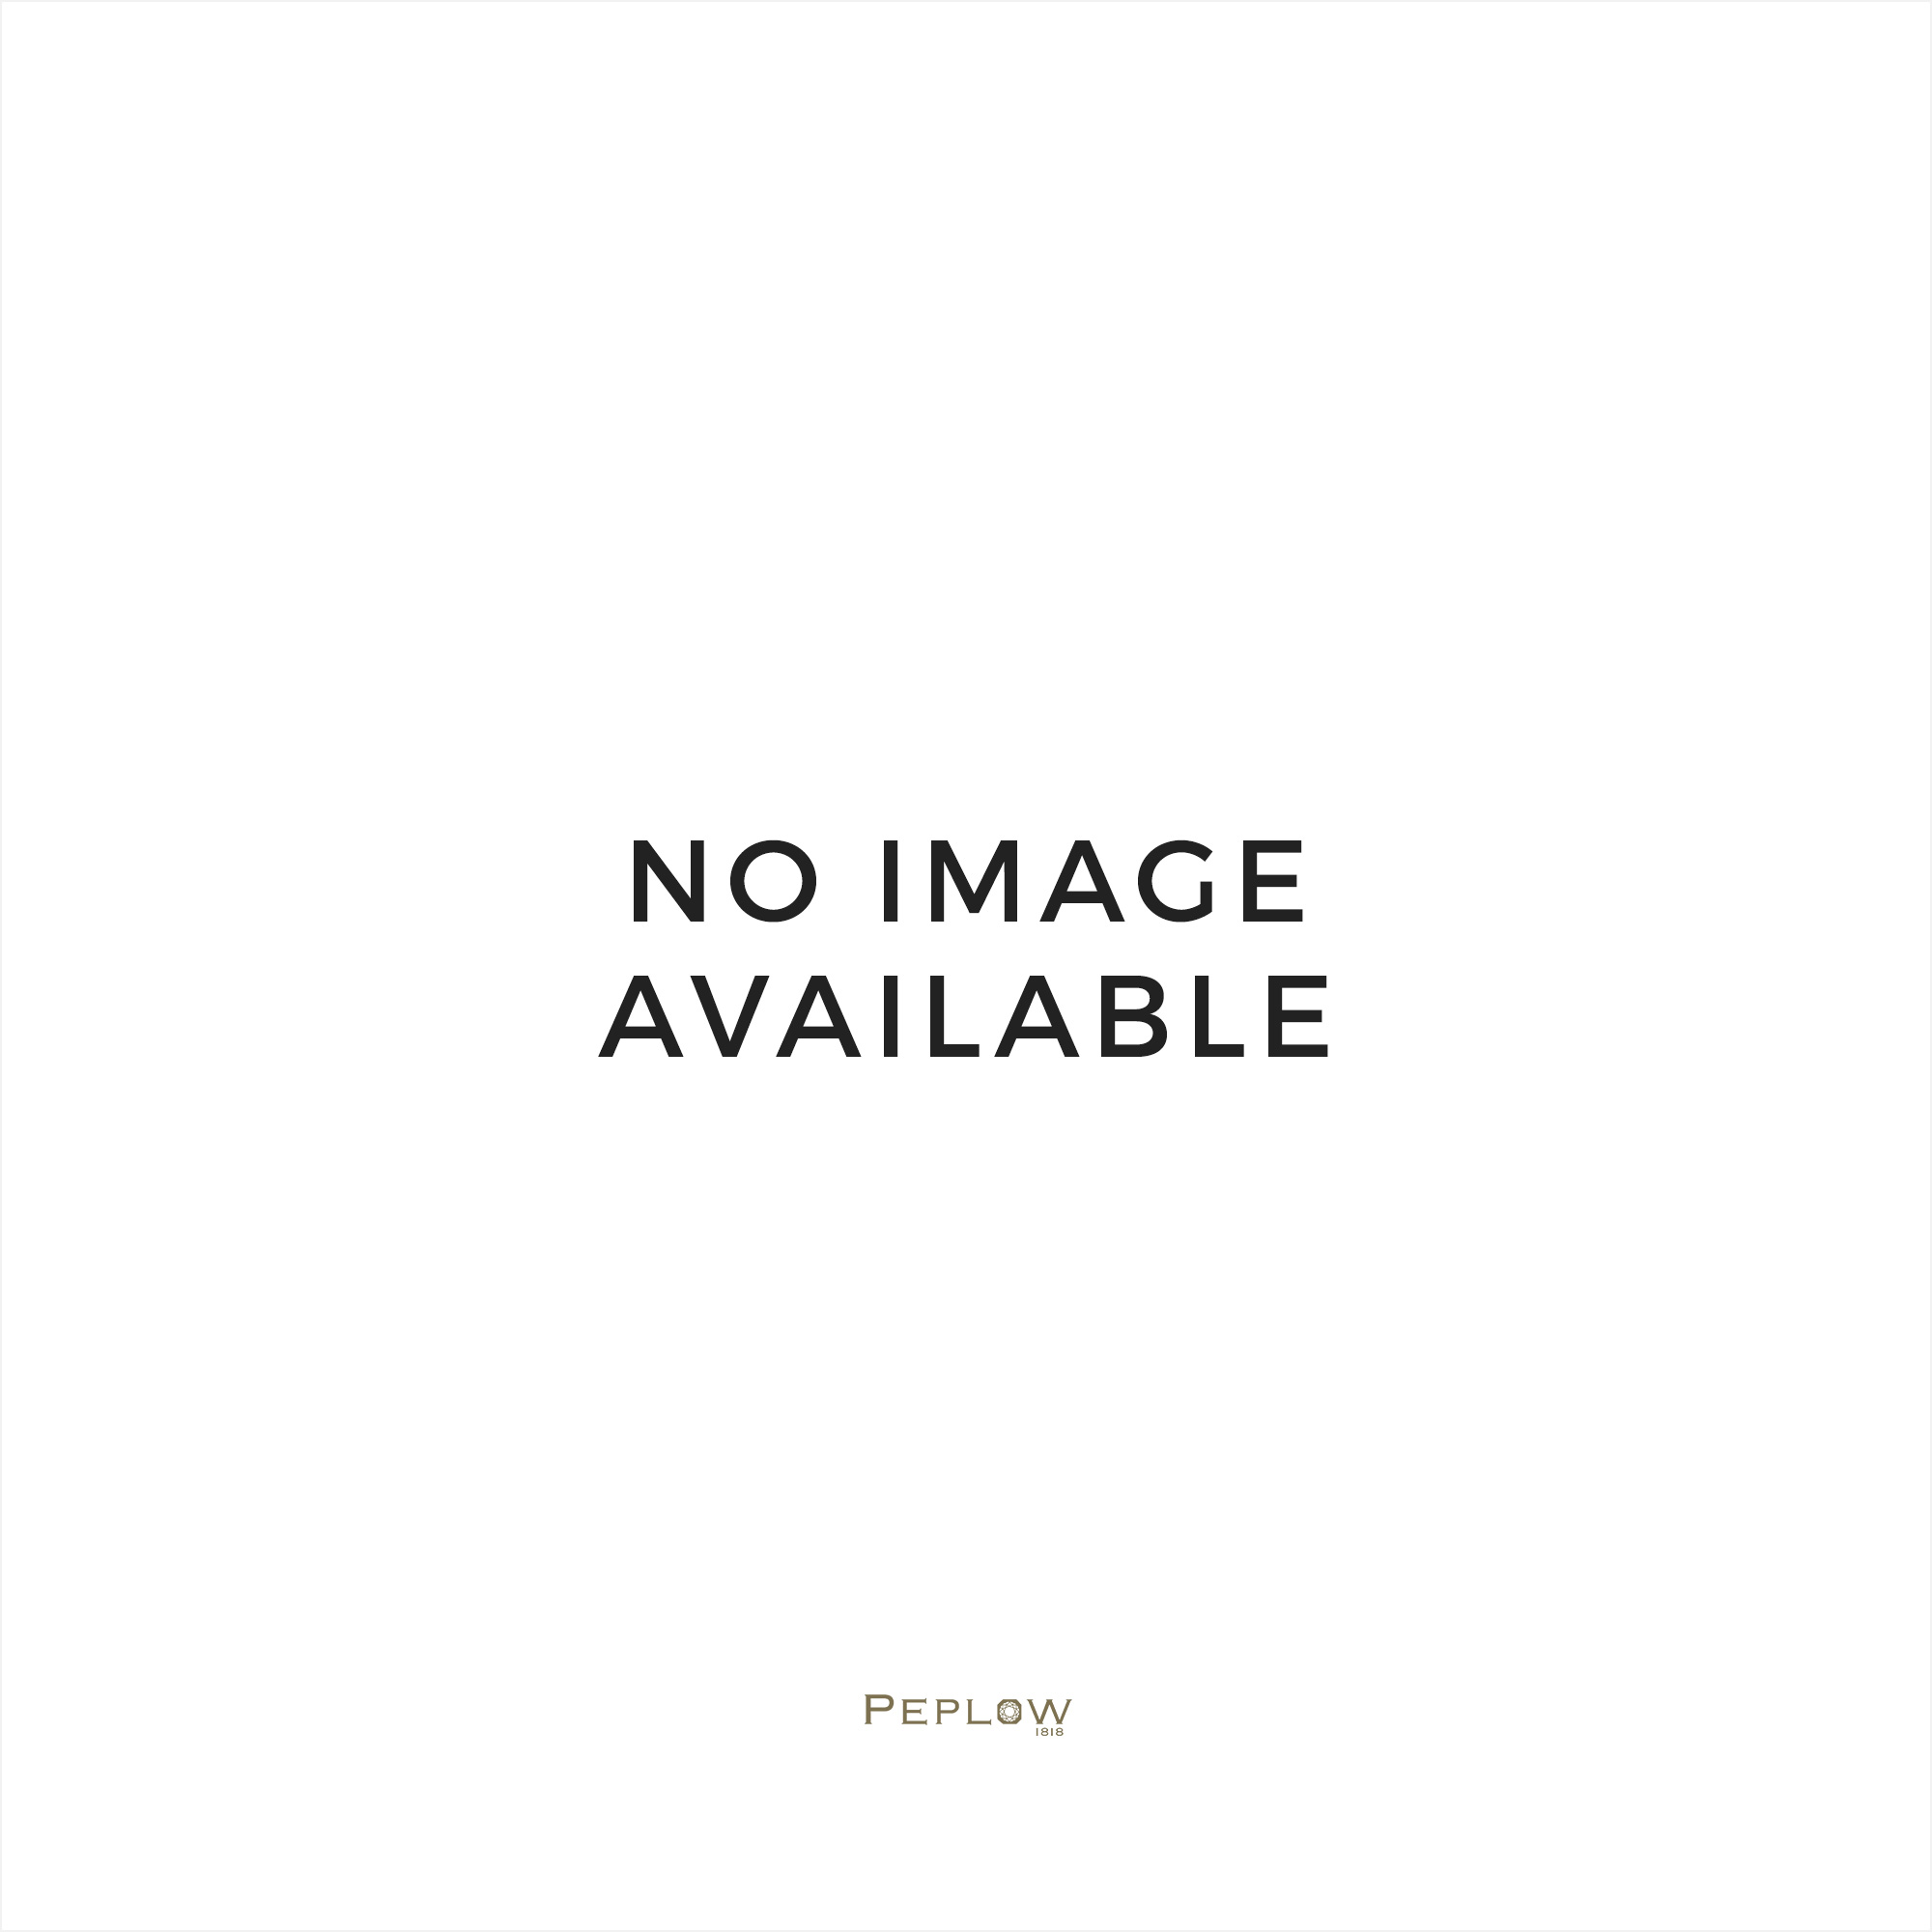 Black freshwater pearl earrings on silver stud backs